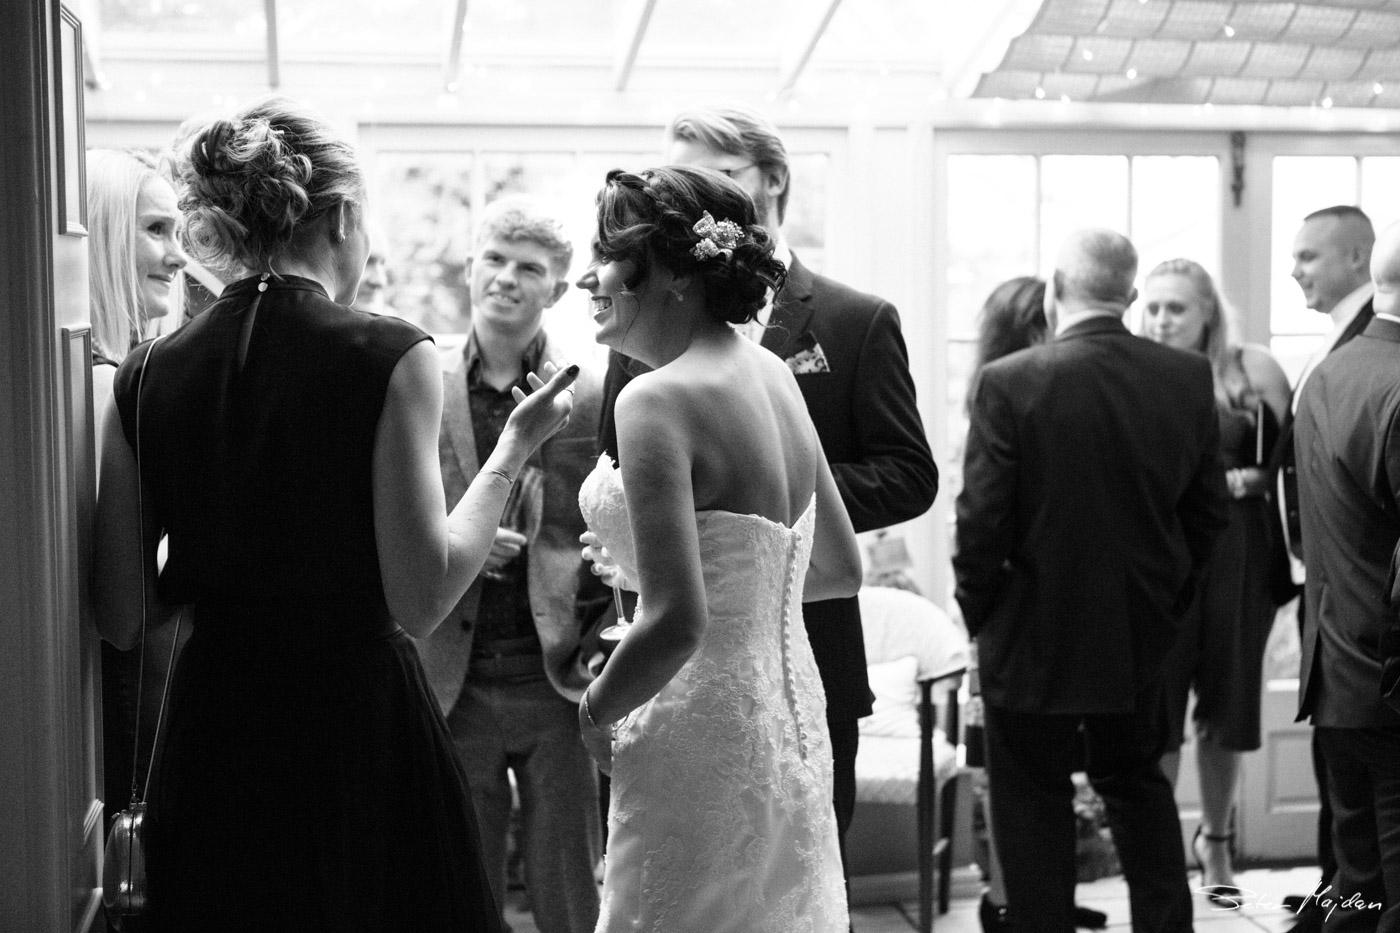 east-bridgford-hill-wedding-photography-39.jpg